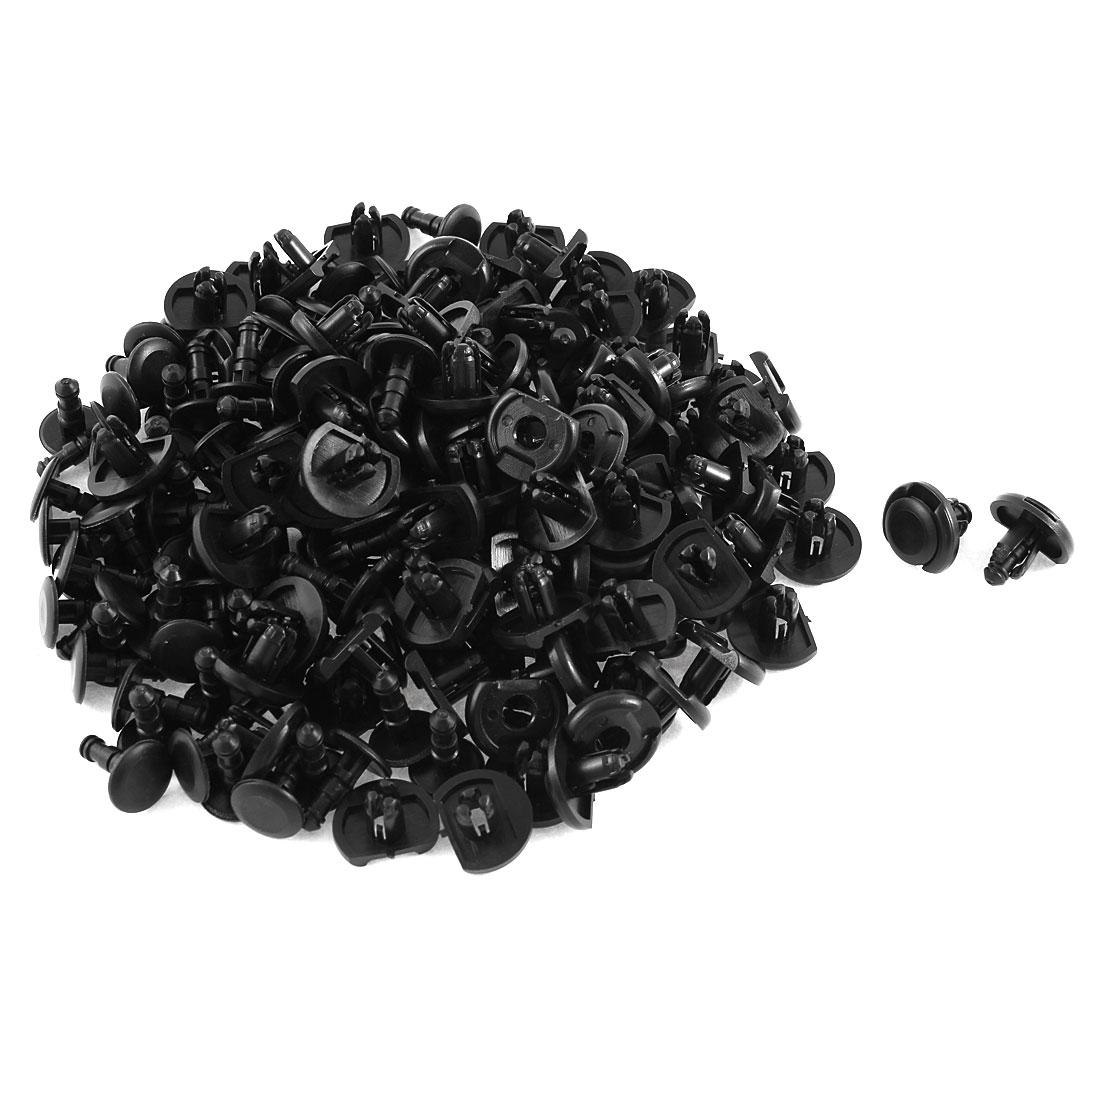 100 Pcs Black Plastic Rivet Trim Fastener Moulding Clips 7mm x 10mm x 19mm